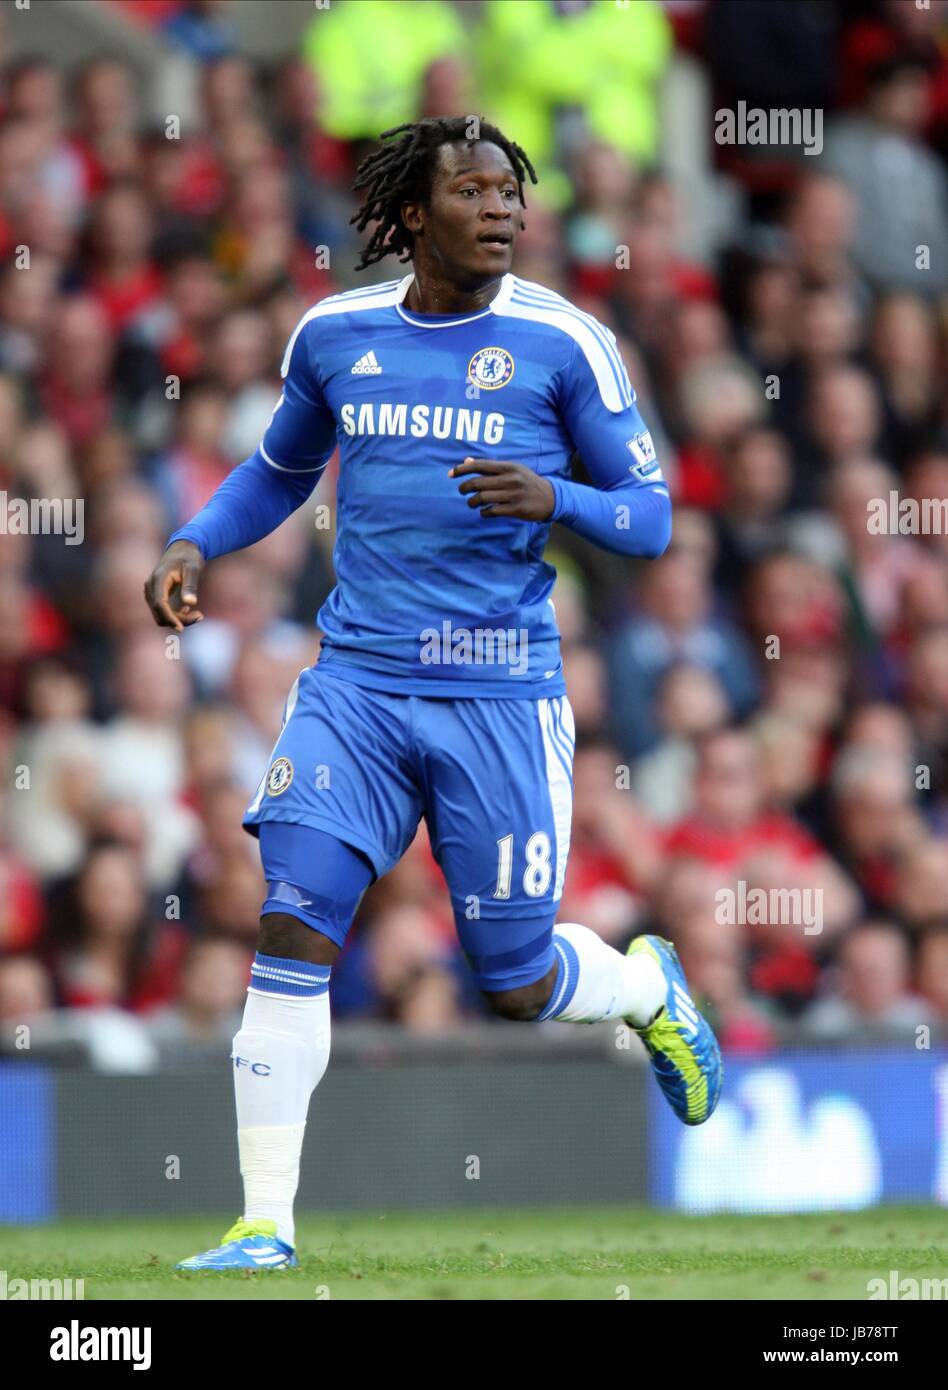 Romelu Lukaku Chelsea Fc Chelsea Fc Old Trafford Manchester England Stock Photo Alamy